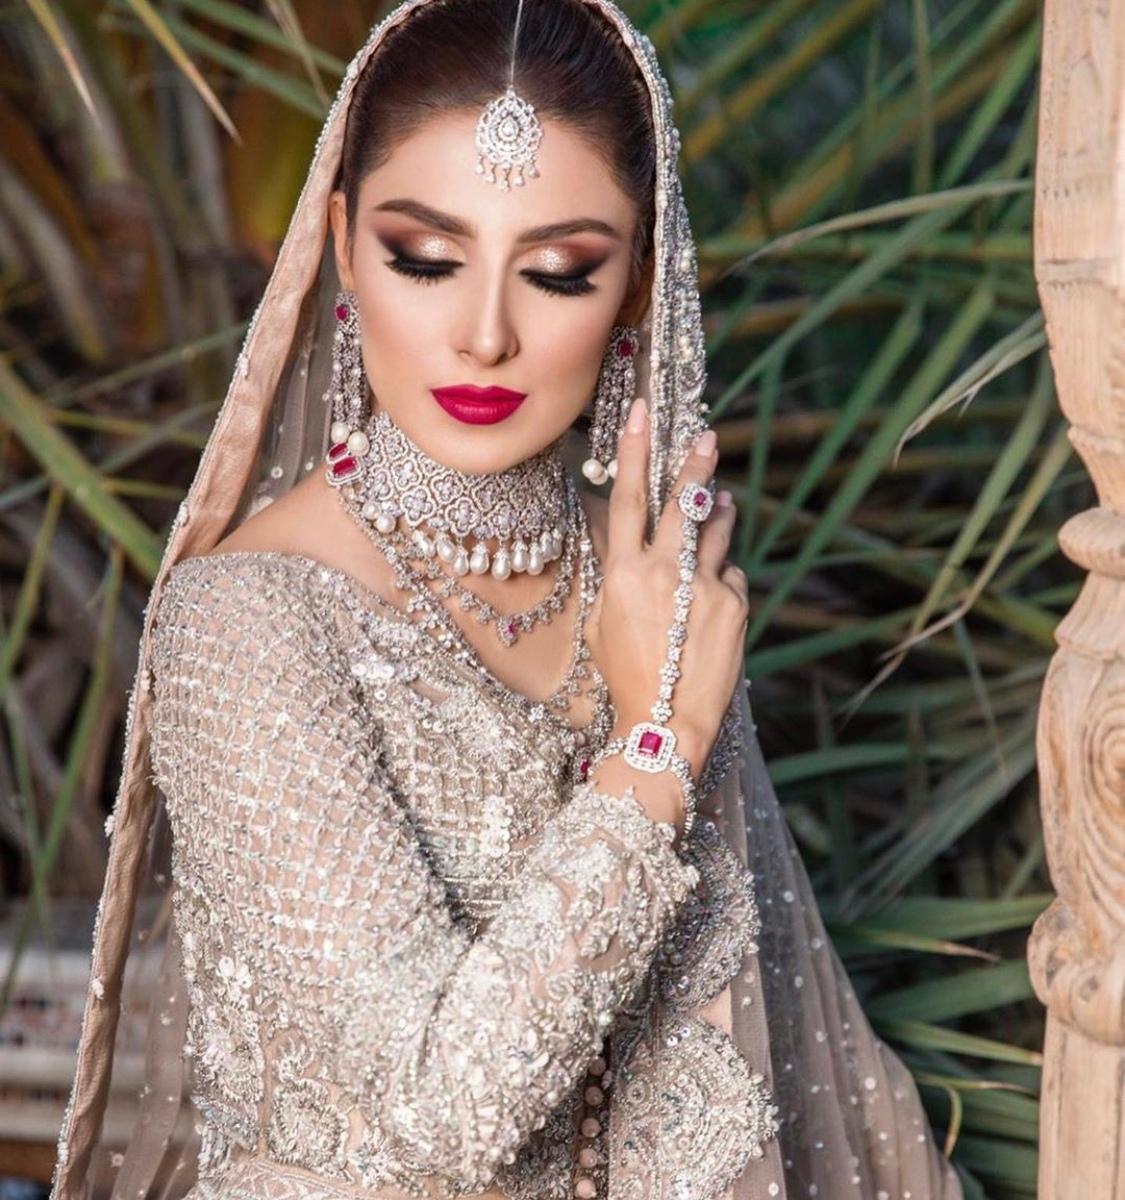 ayeza khan the odd onee